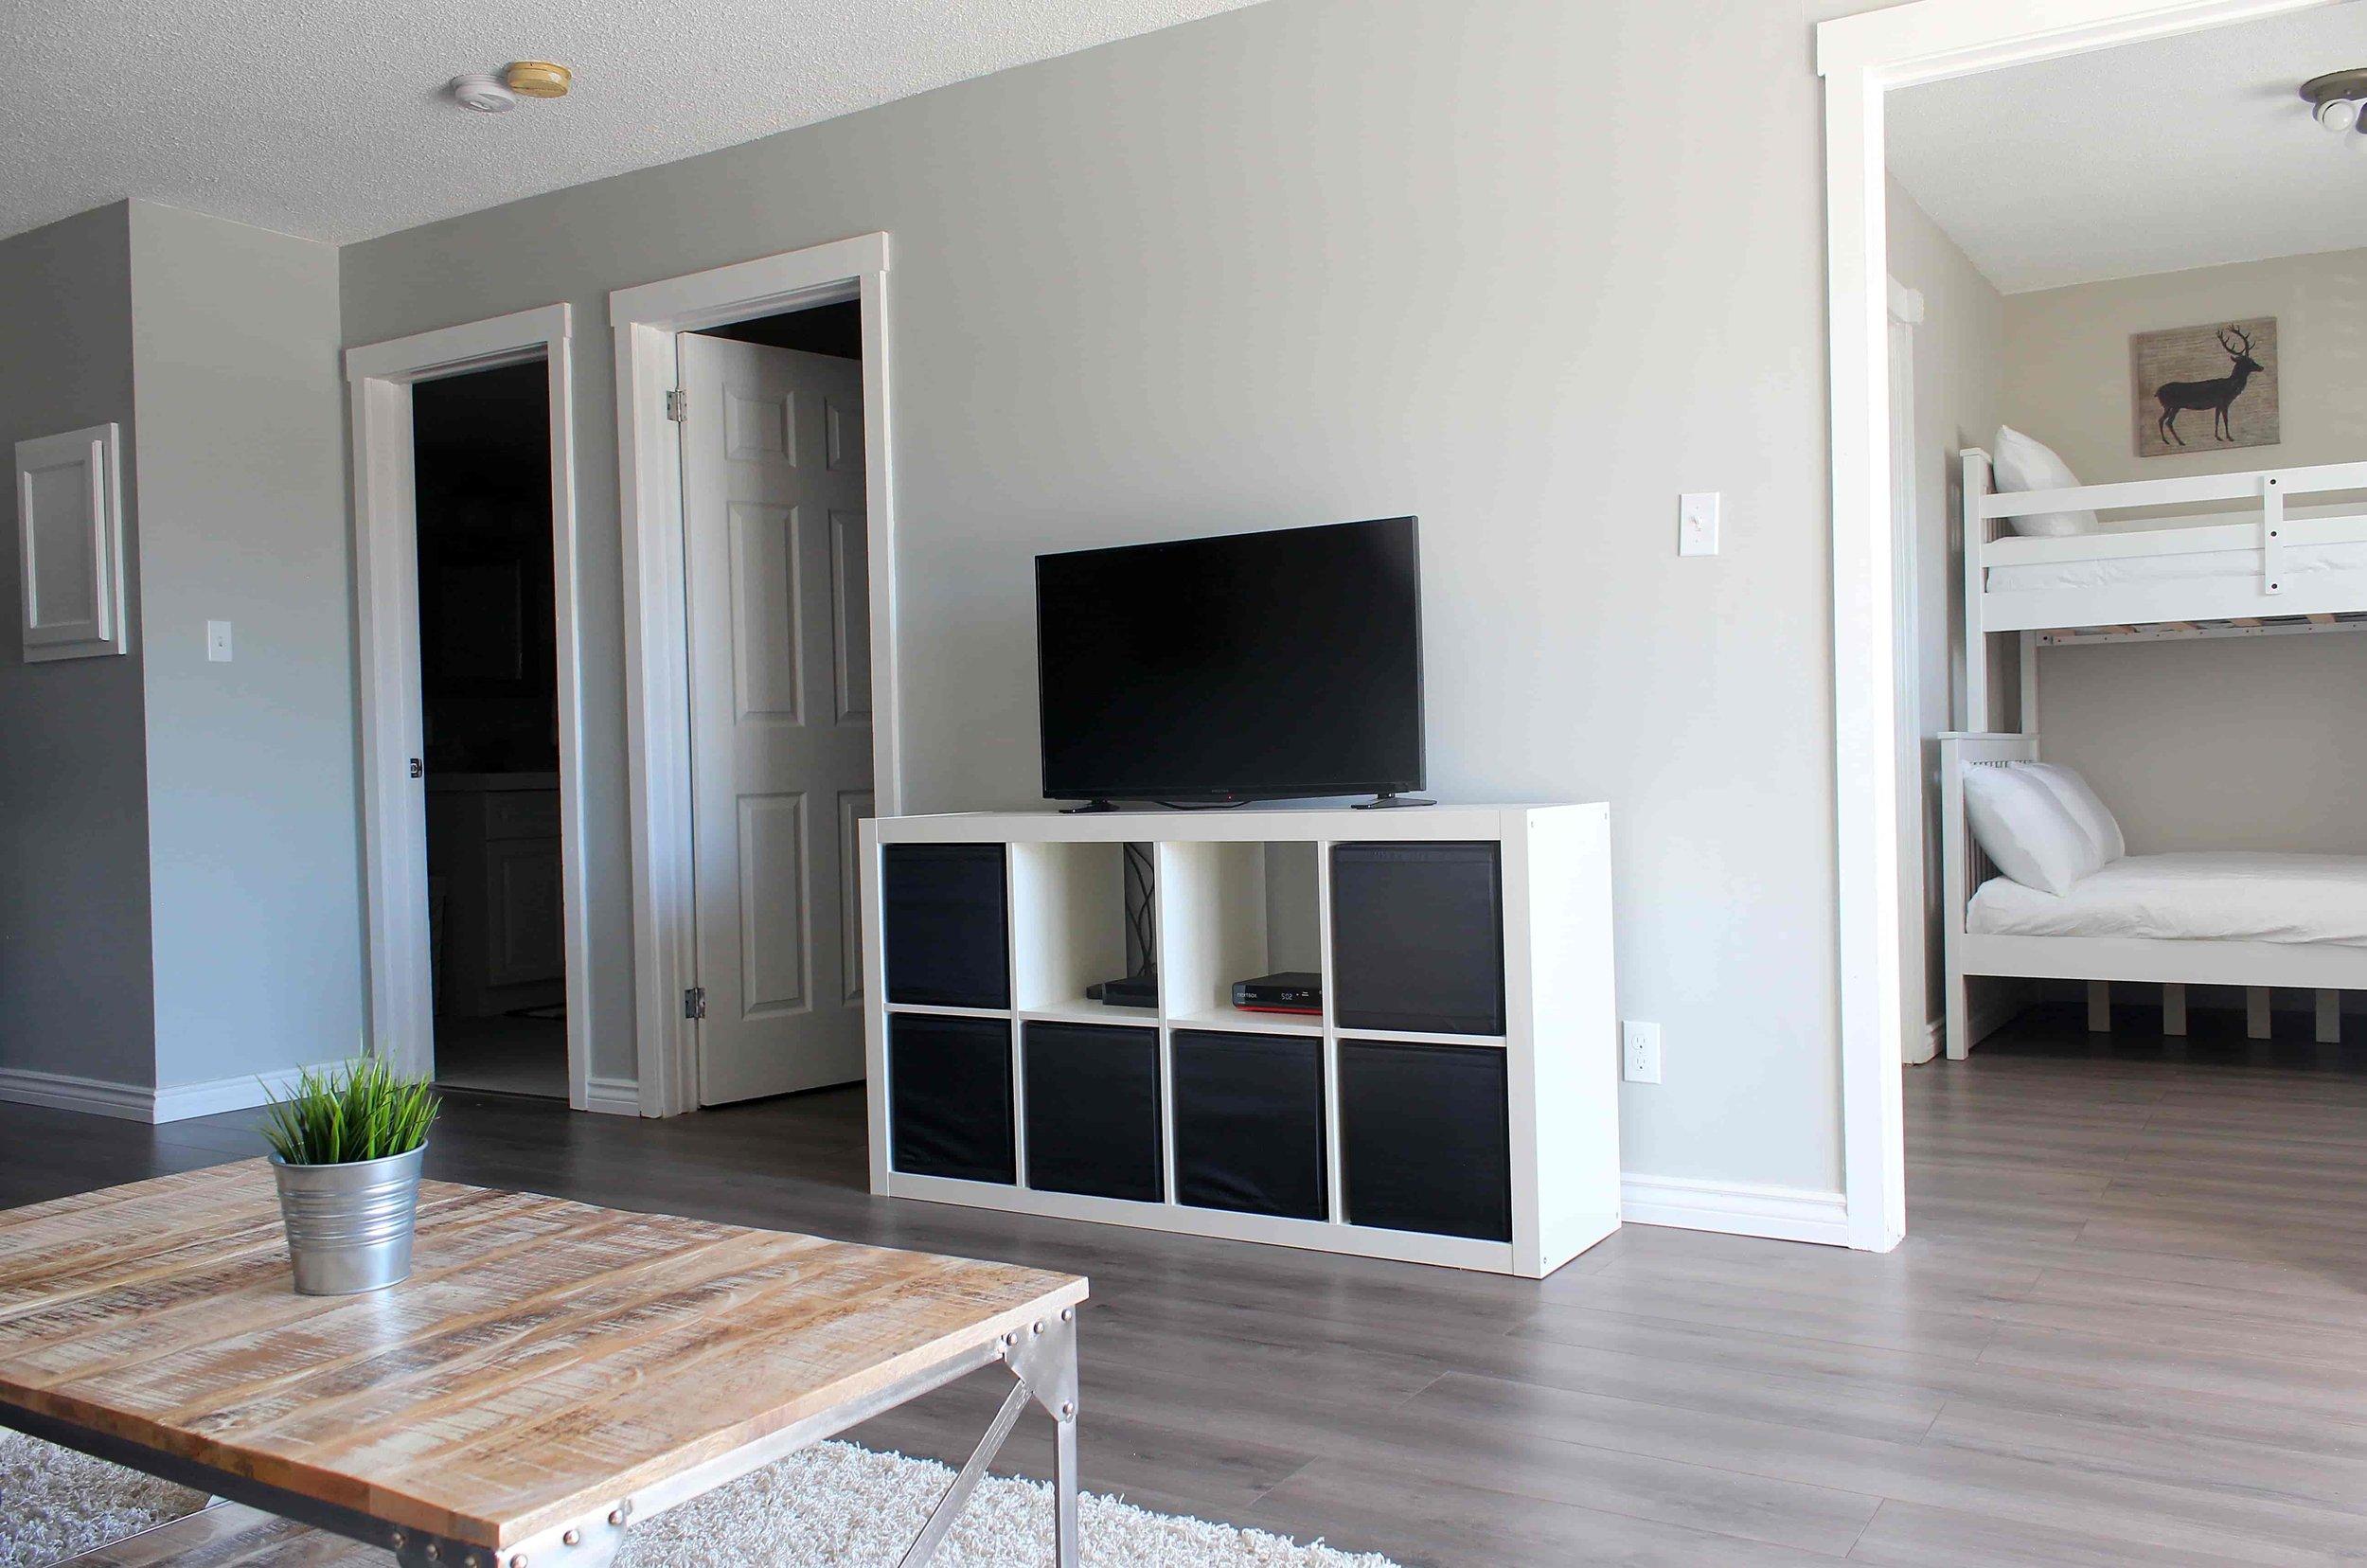 5_Moose_Lodge_Livingroom-min.jpg